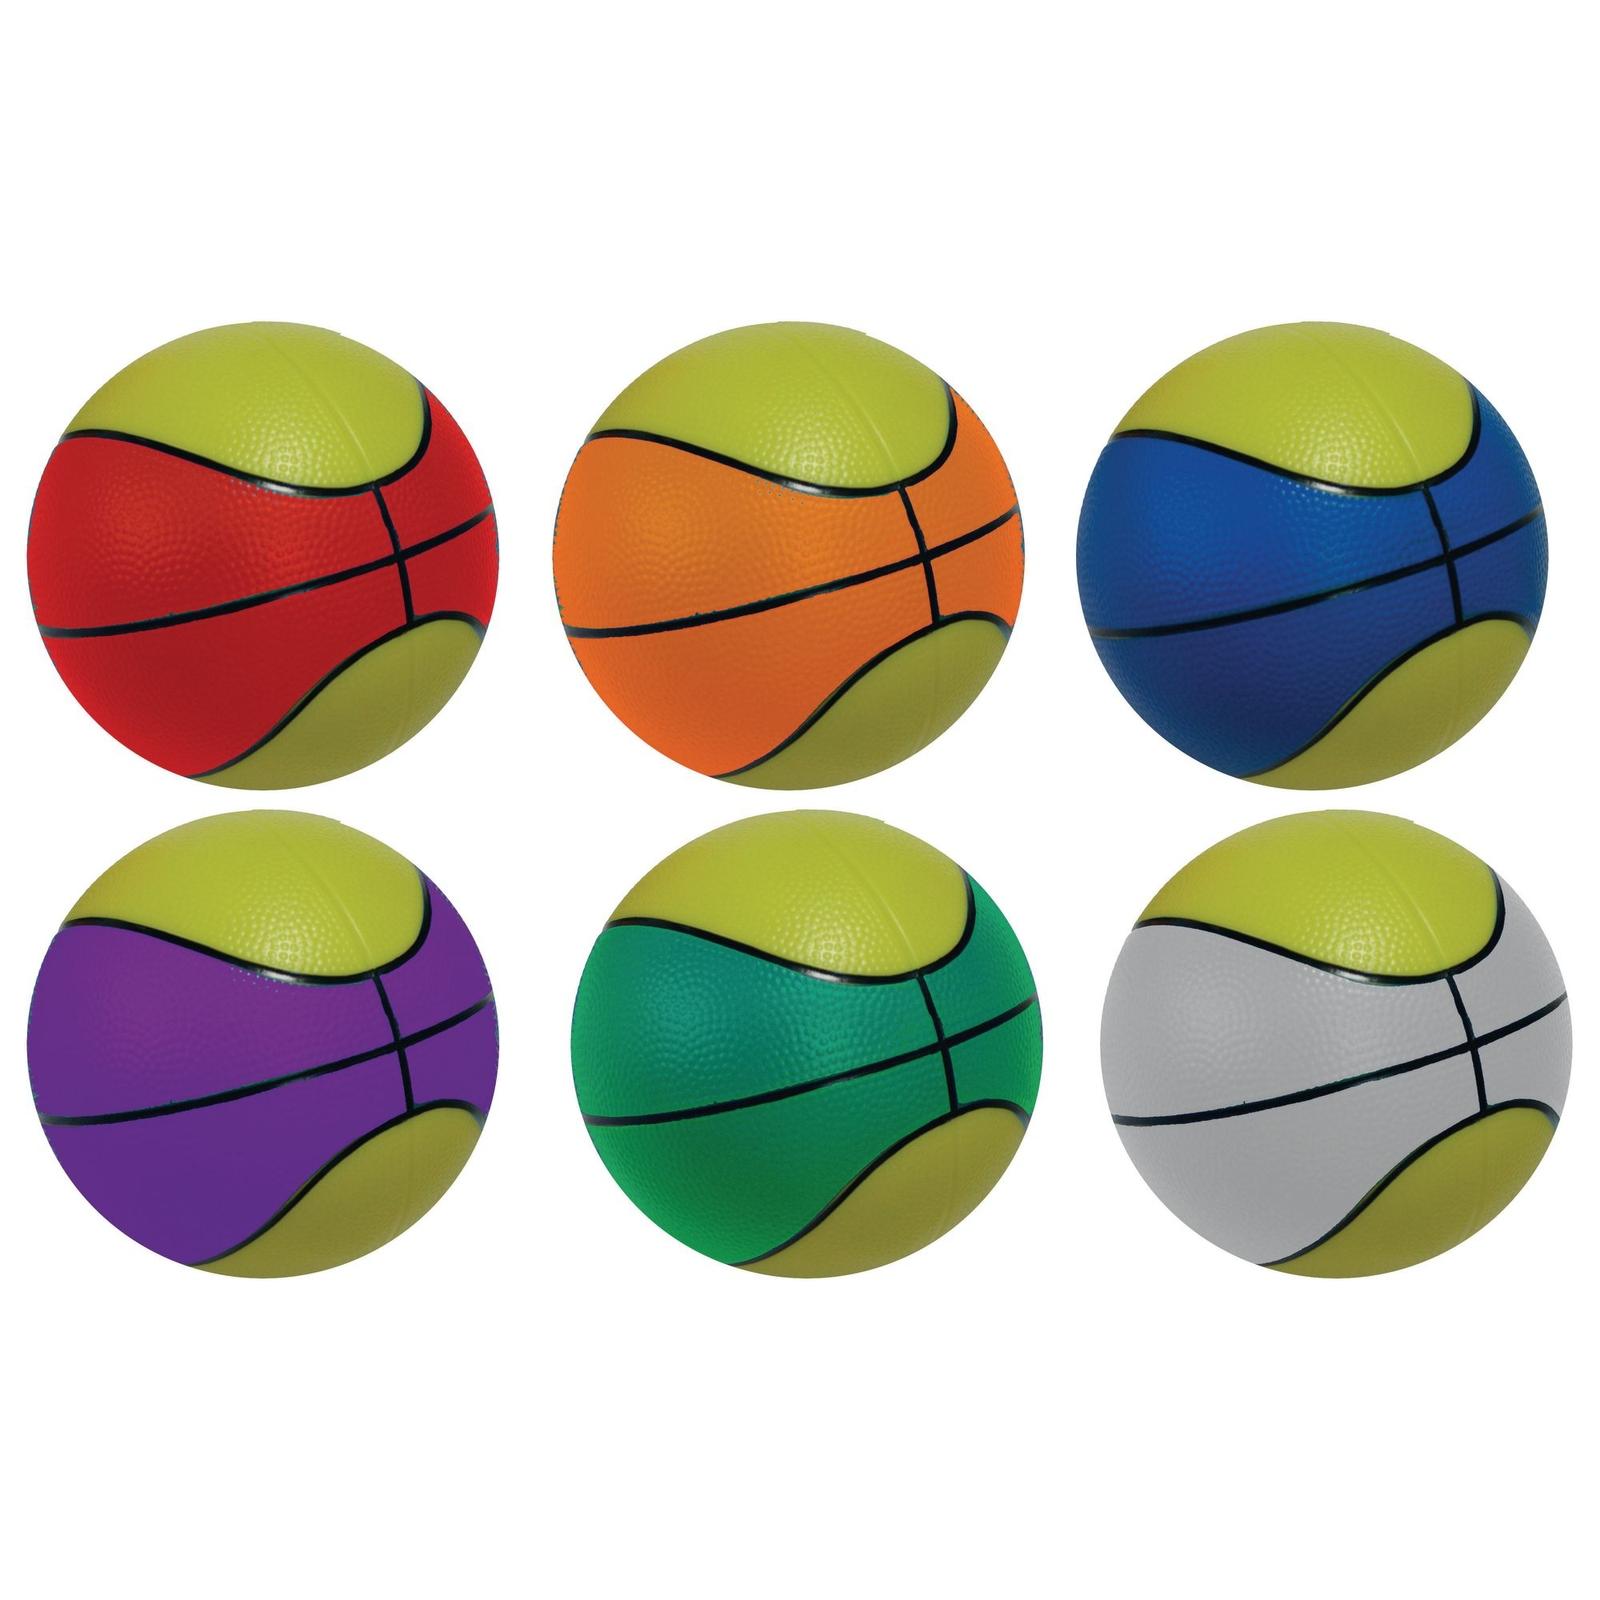 Retro Basketballs - Pack of 6